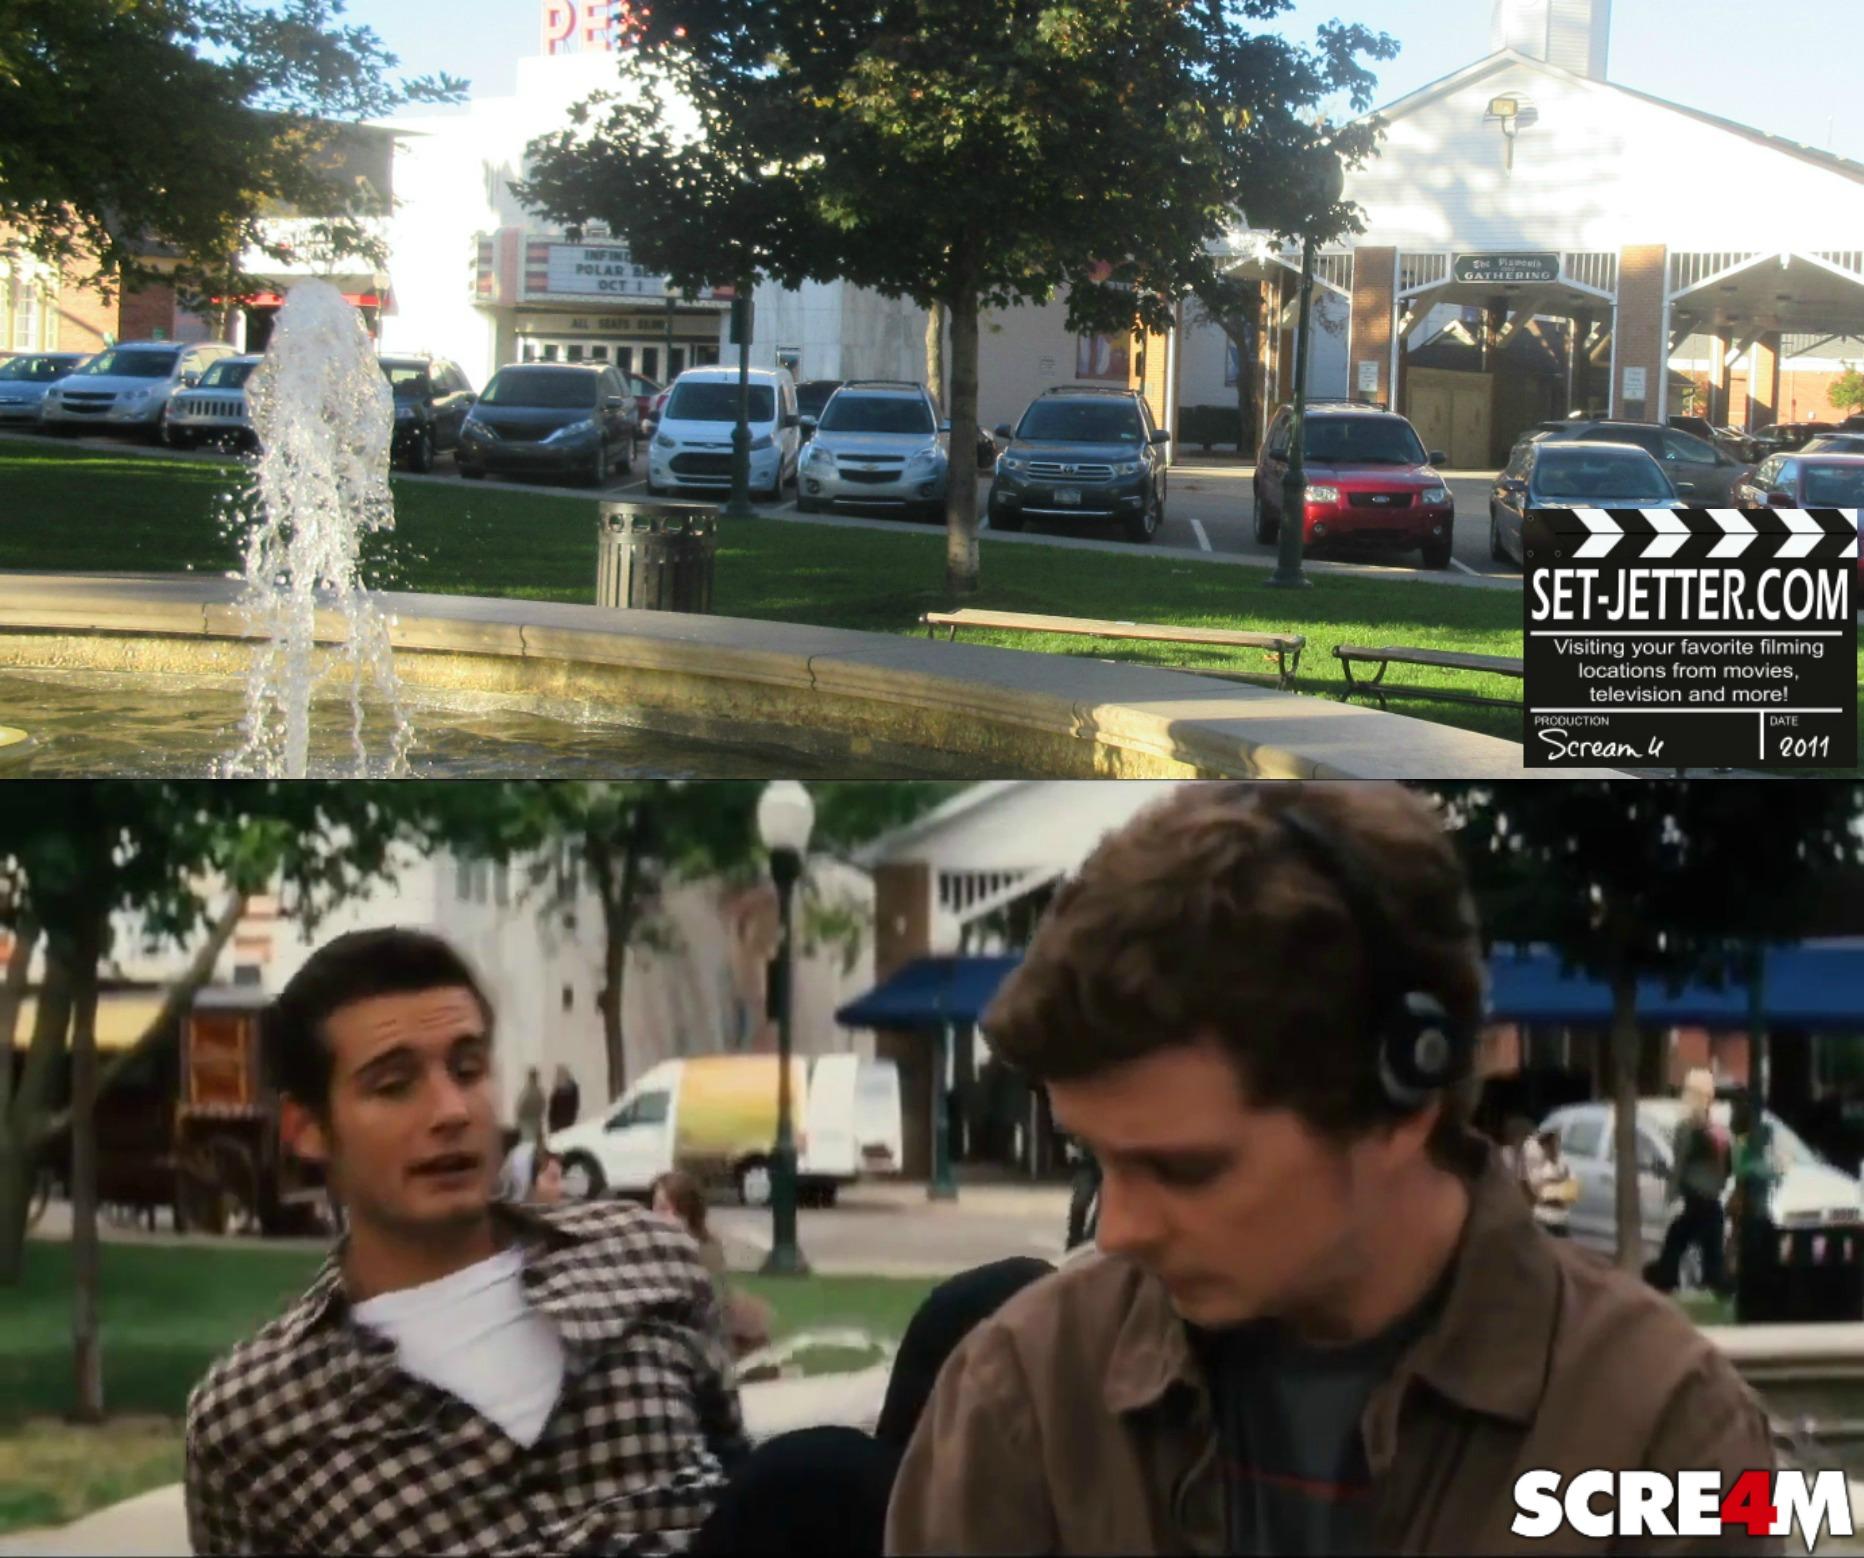 Scream4 comparison 157.jpg